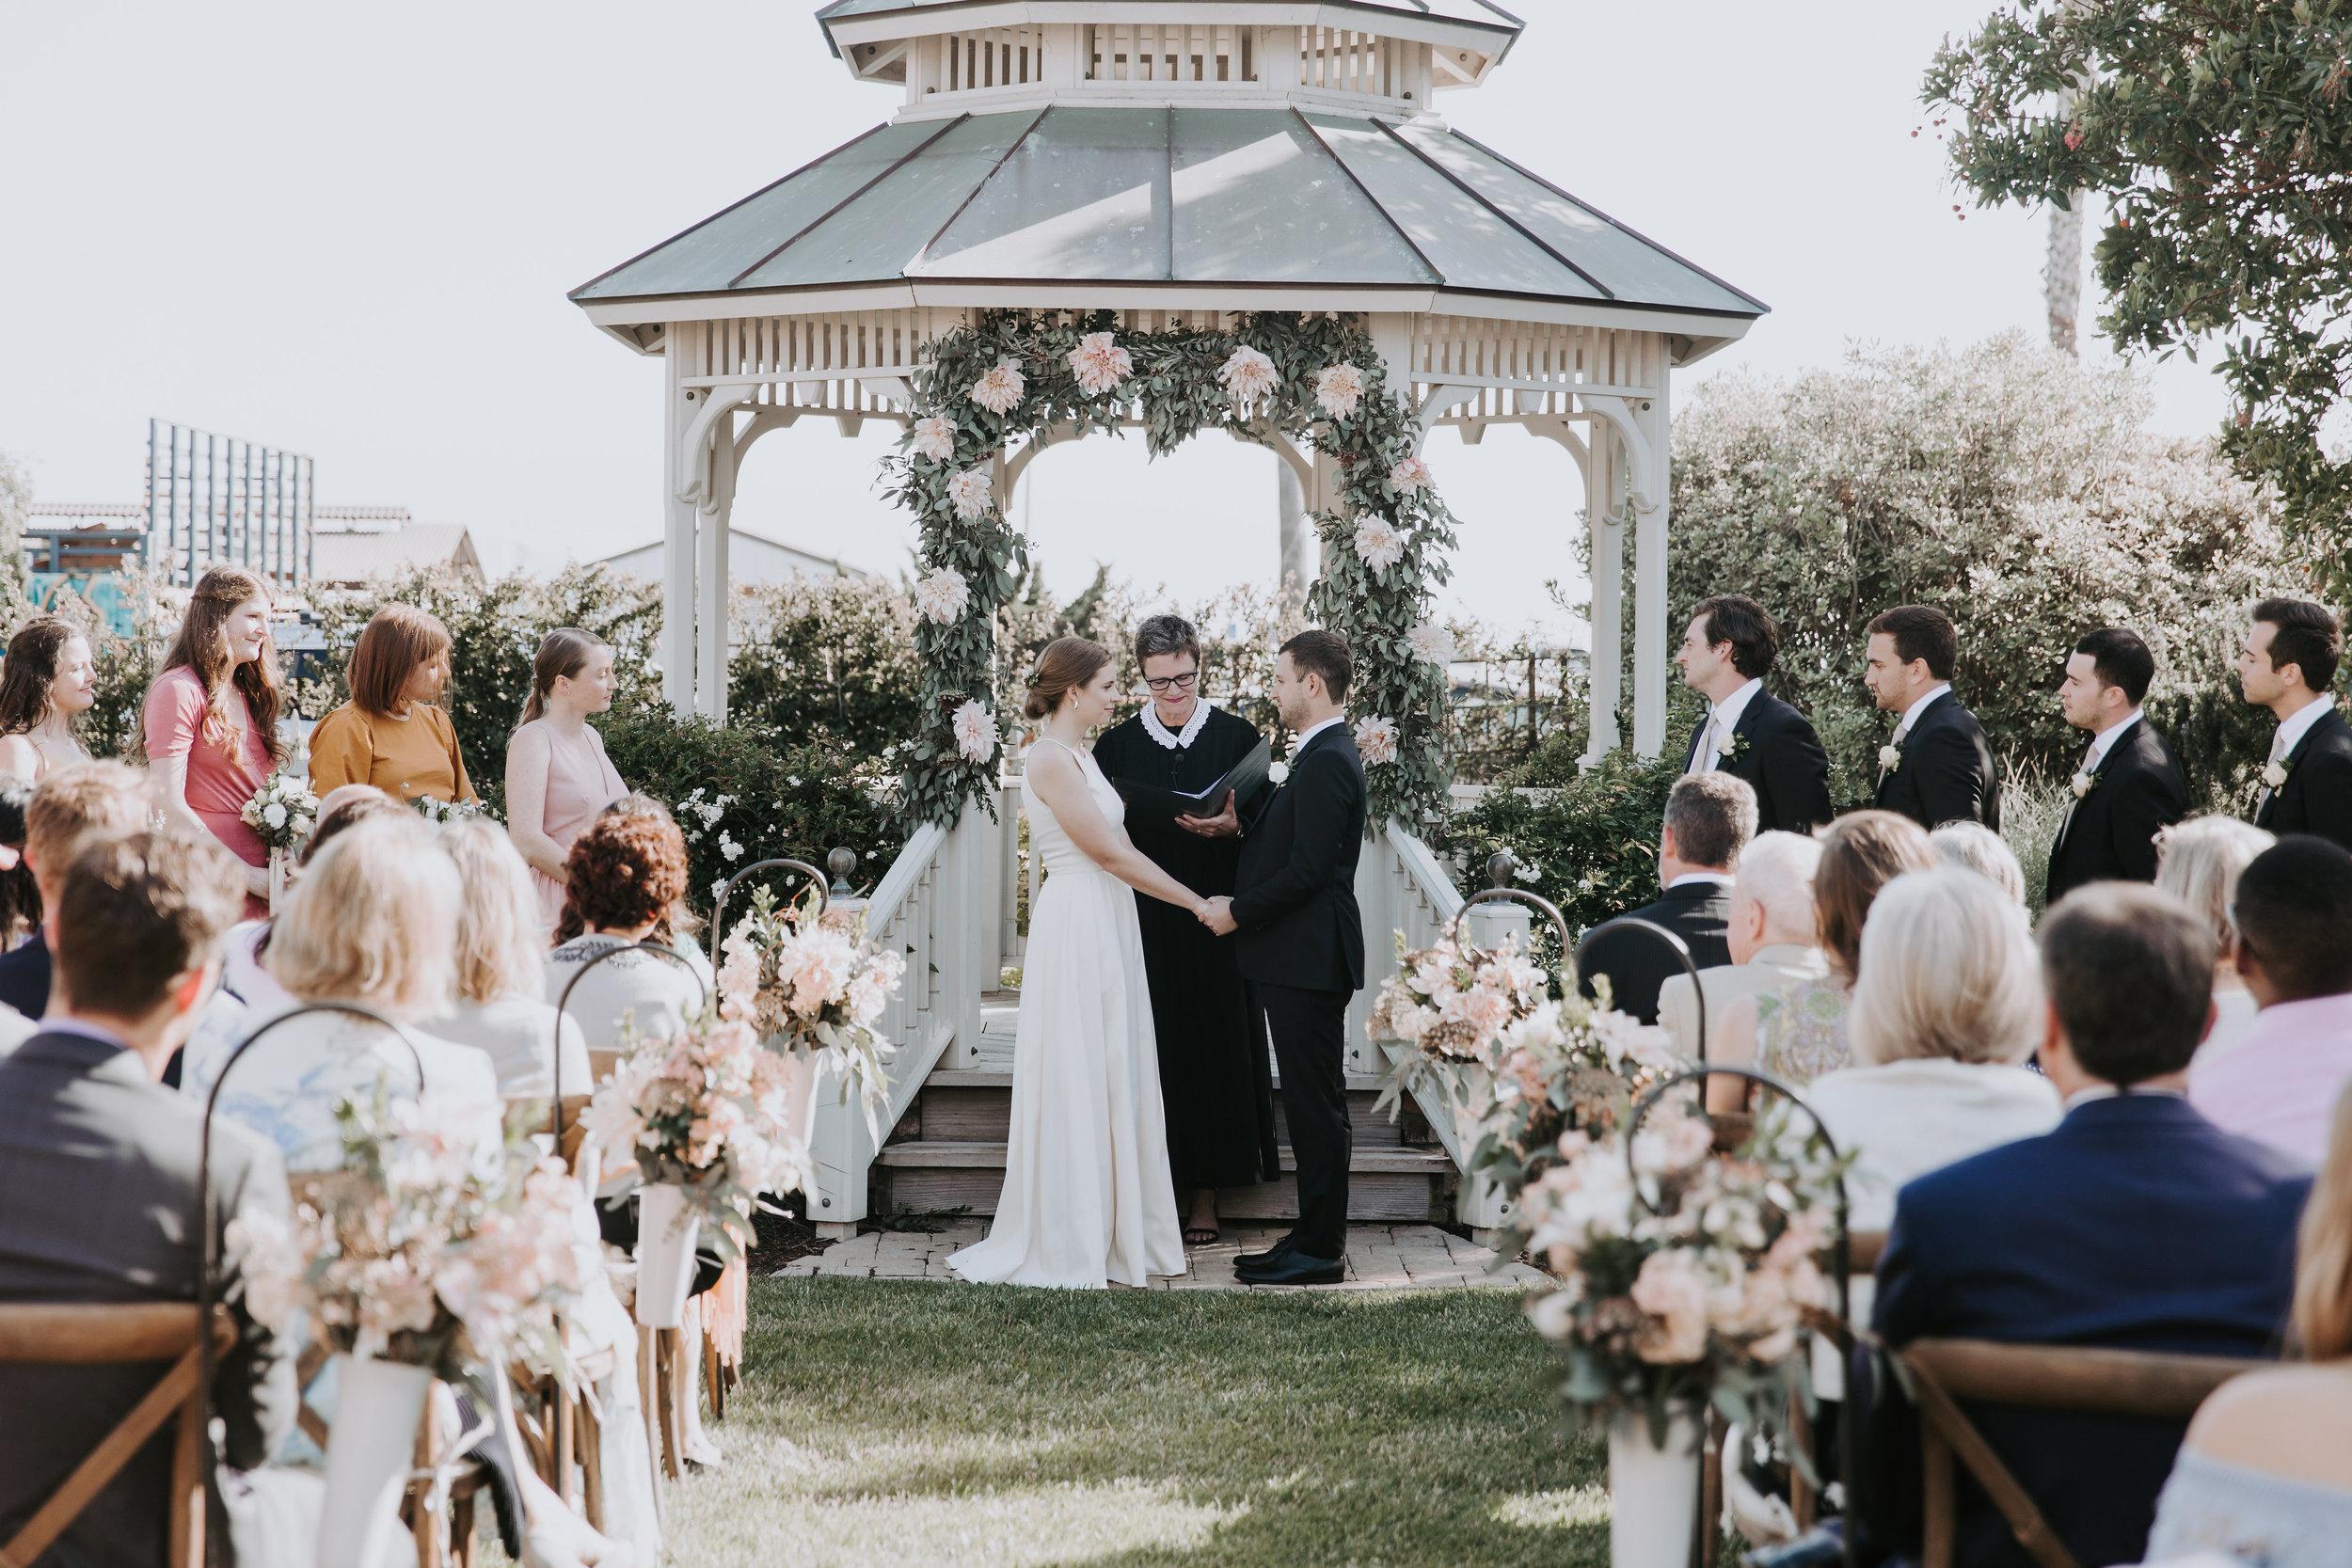 May Iosotaluno Cayucos Beach Town Wedding 25.jpg